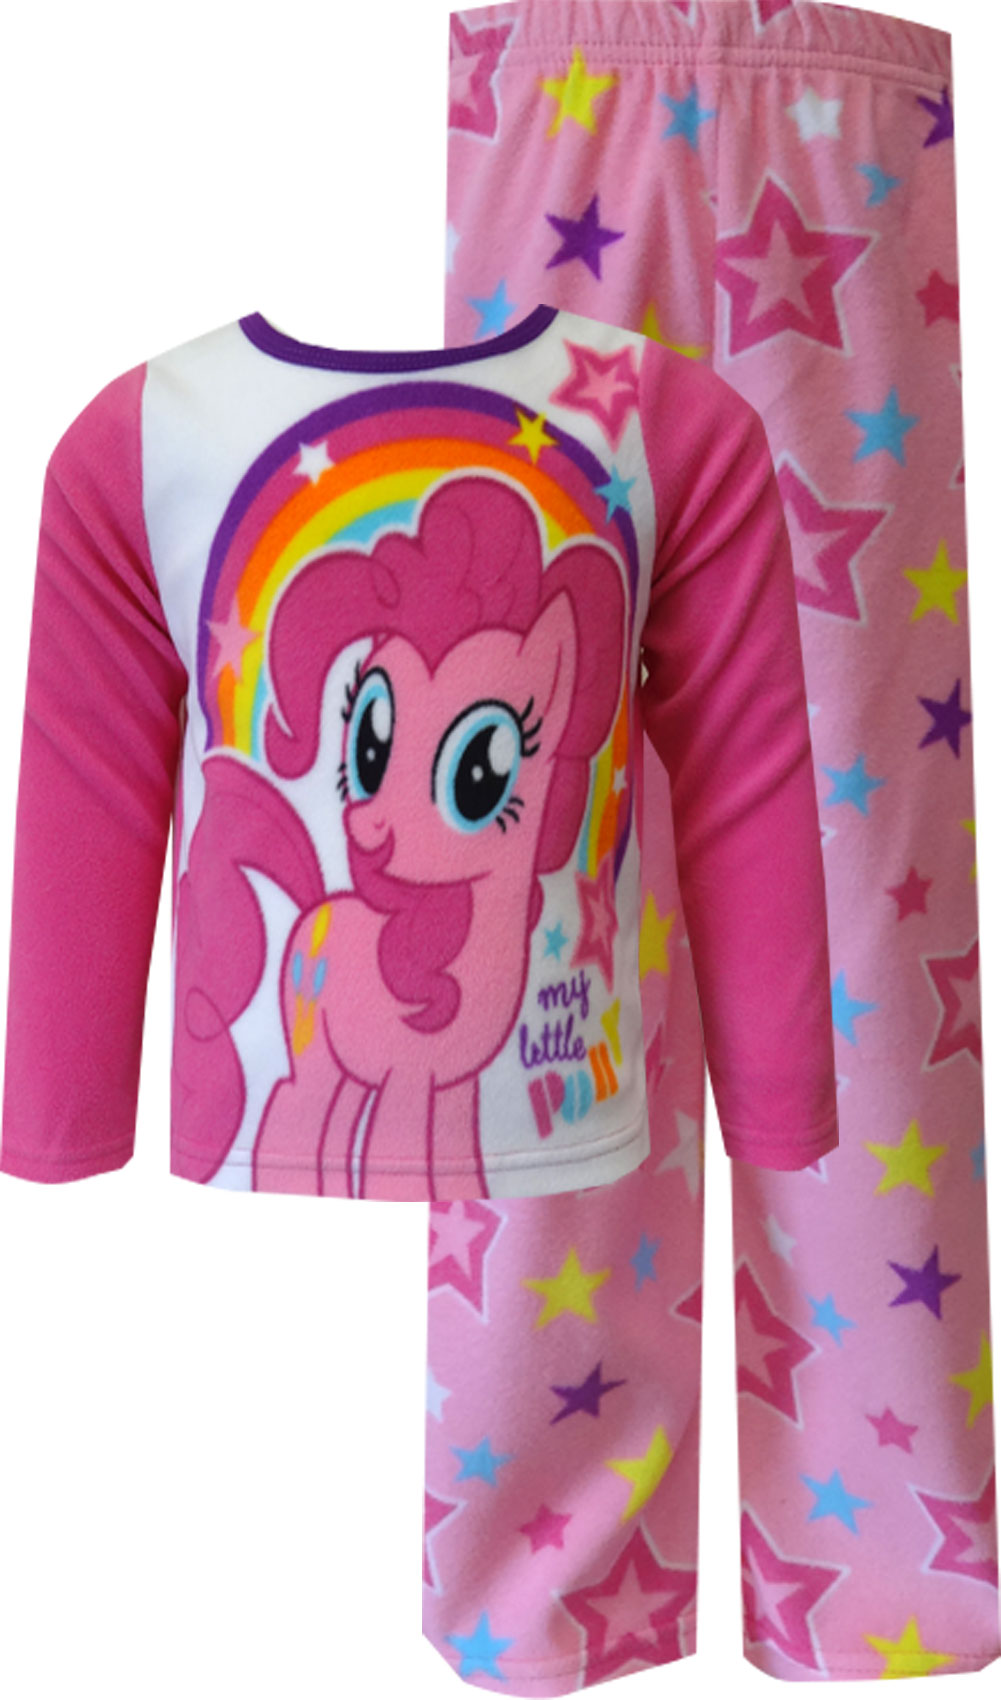 fa374c7ee631 American Marketing Enterprises INC - My Little Pony Pinkie Pie ...